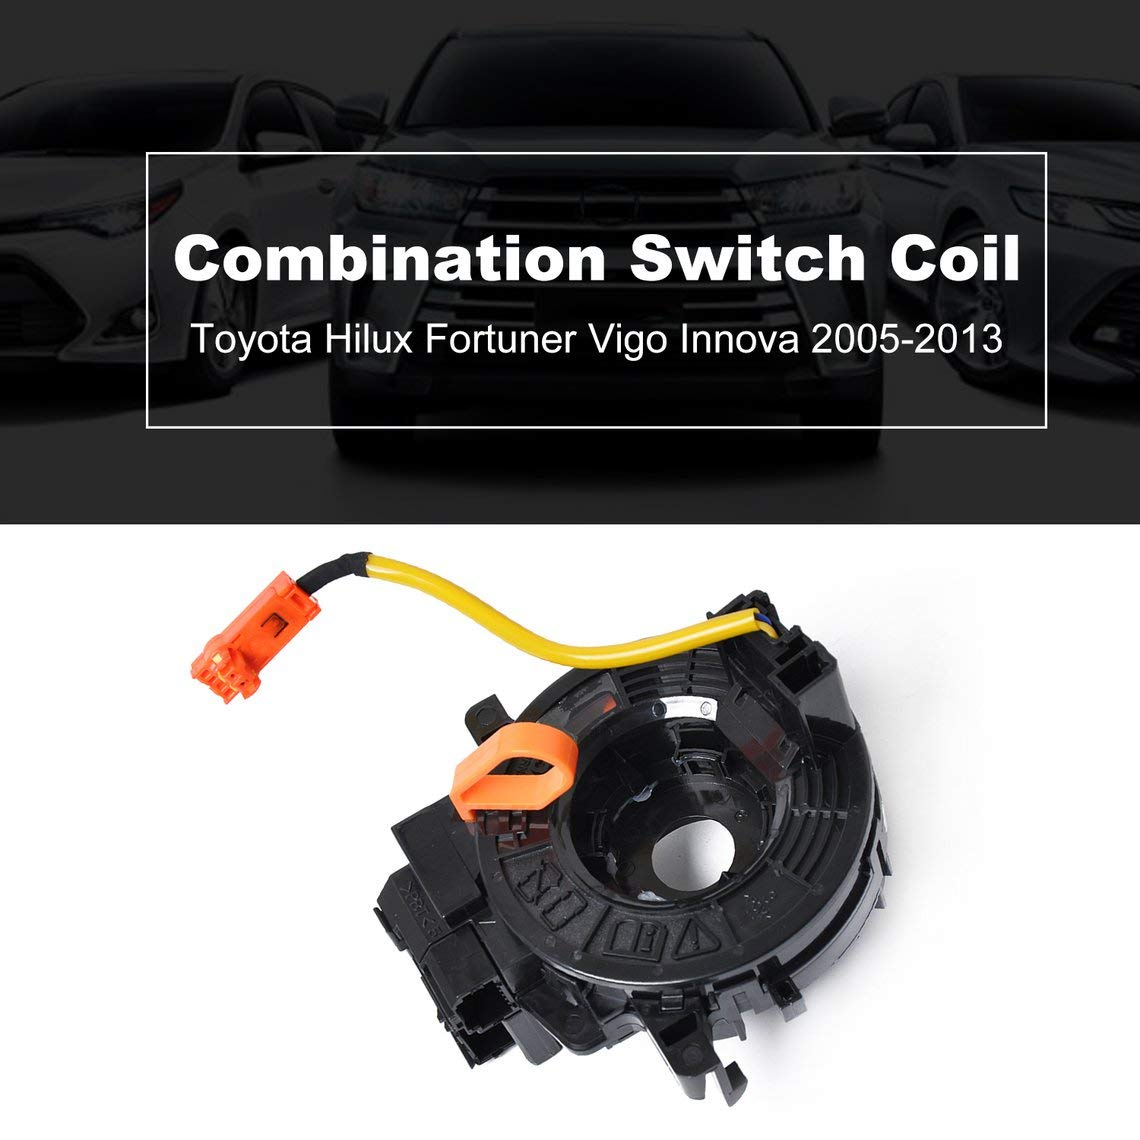 Zinniaya Ressort de contact pour Toyota Hilux Fortuner Vigo Innova 2005-2013 84306-0K020 84306-0K021 843060K020 843060K021